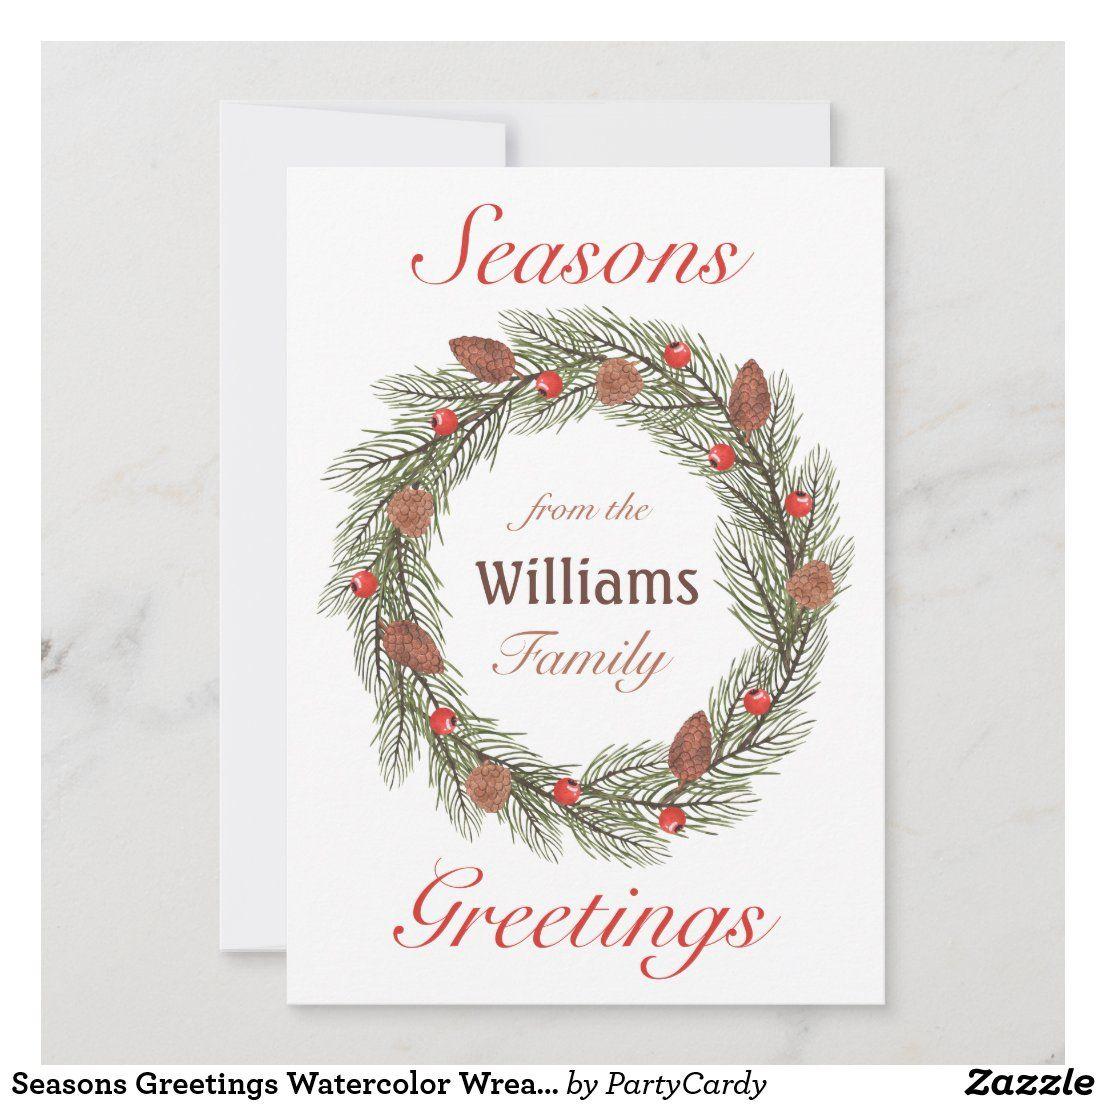 Seasons Greetings Watercolor Wreath Christmas Holiday Card